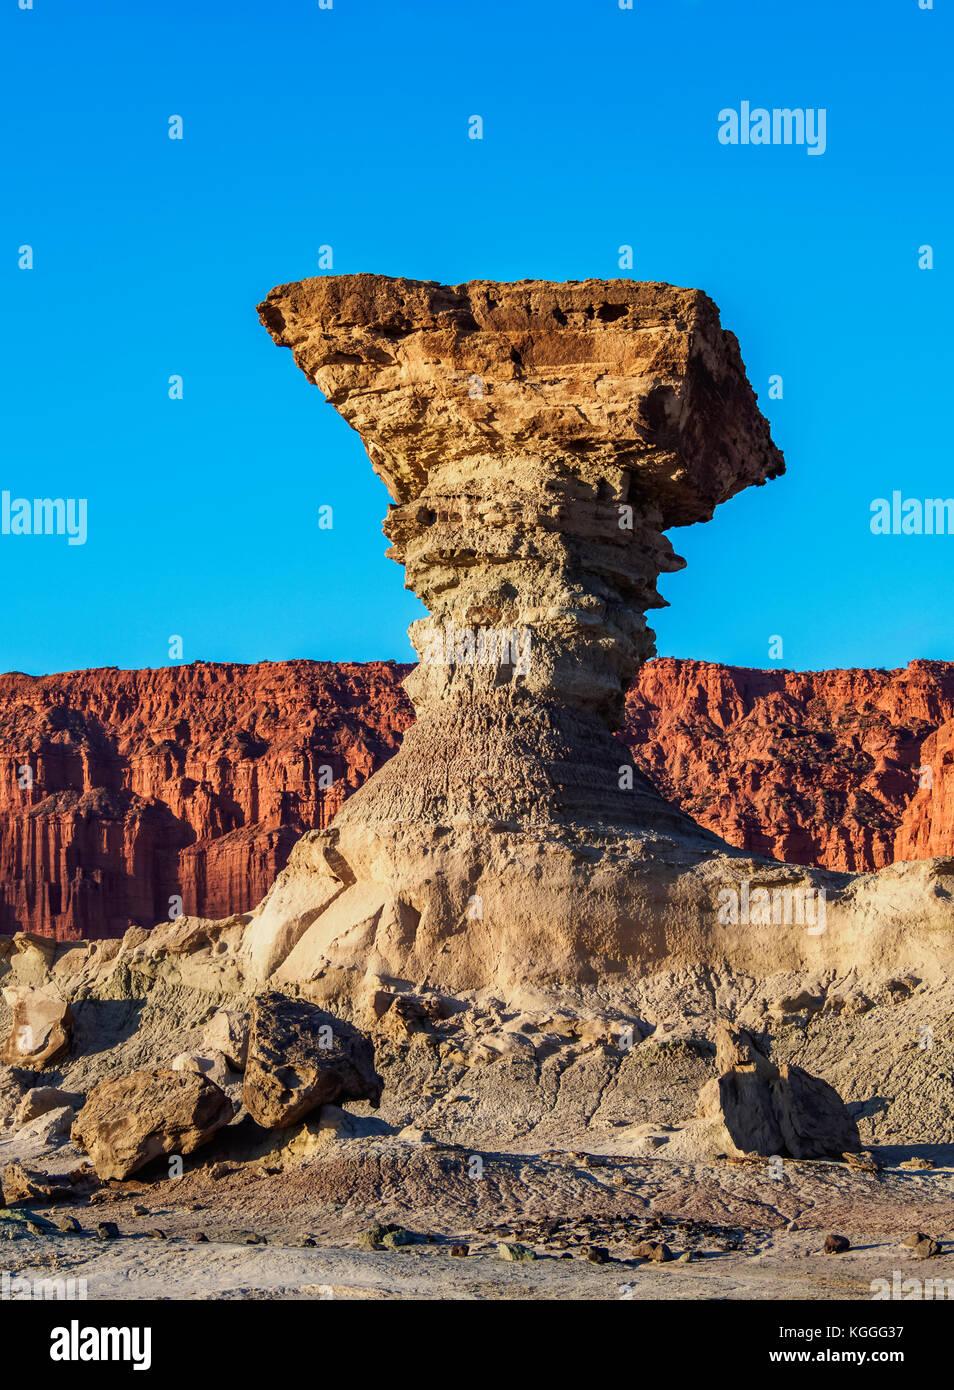 The Mushroom Rock Formation, Ischigualasto Provincial Park, UNESCO World Heritage Site, San Juan Province, Argentina - Stock Image